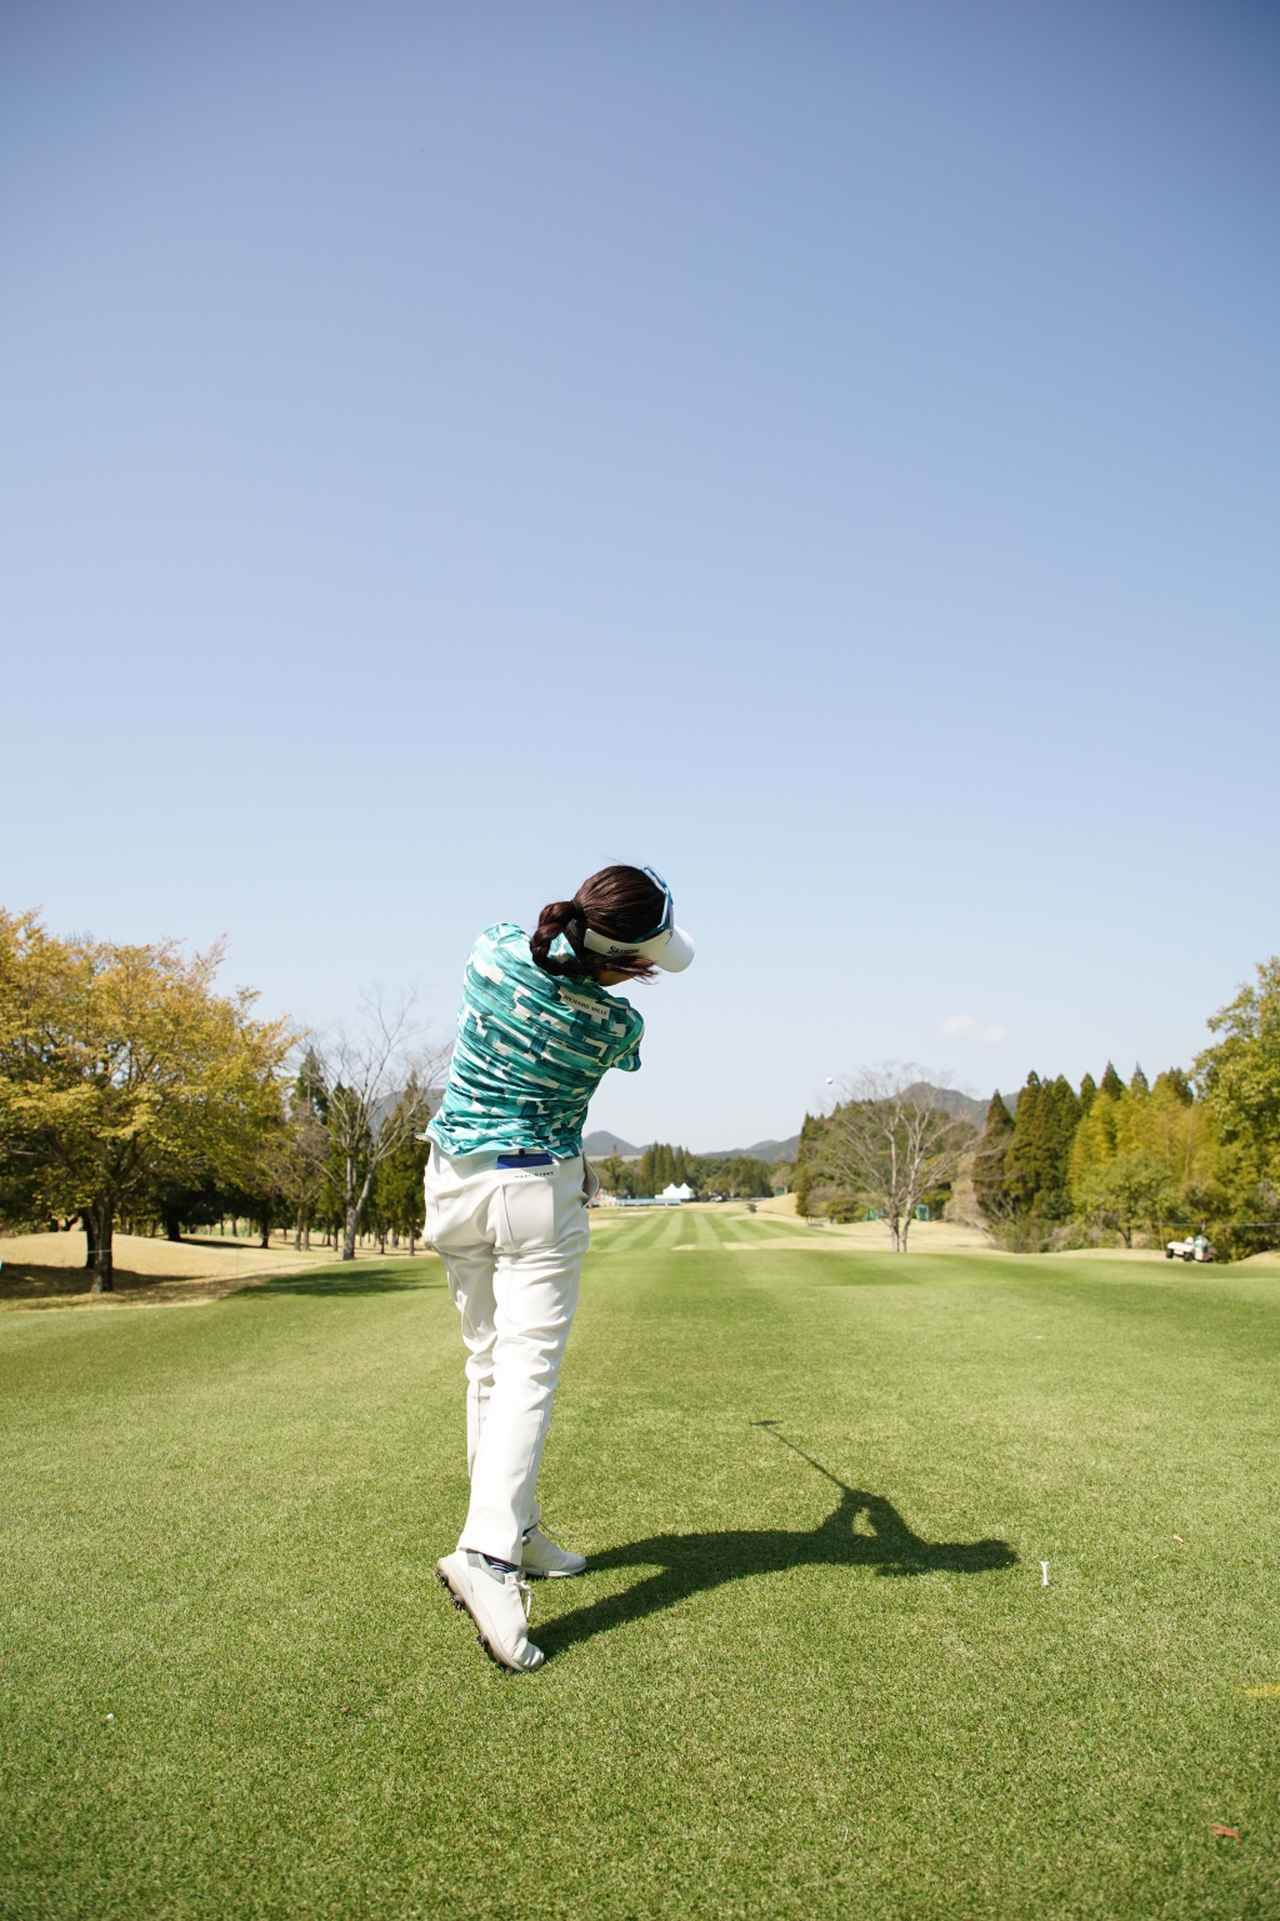 Images : 14番目の画像 - 青木瀬令奈のドライバー連続写真(後方) - みんなのゴルフダイジェスト